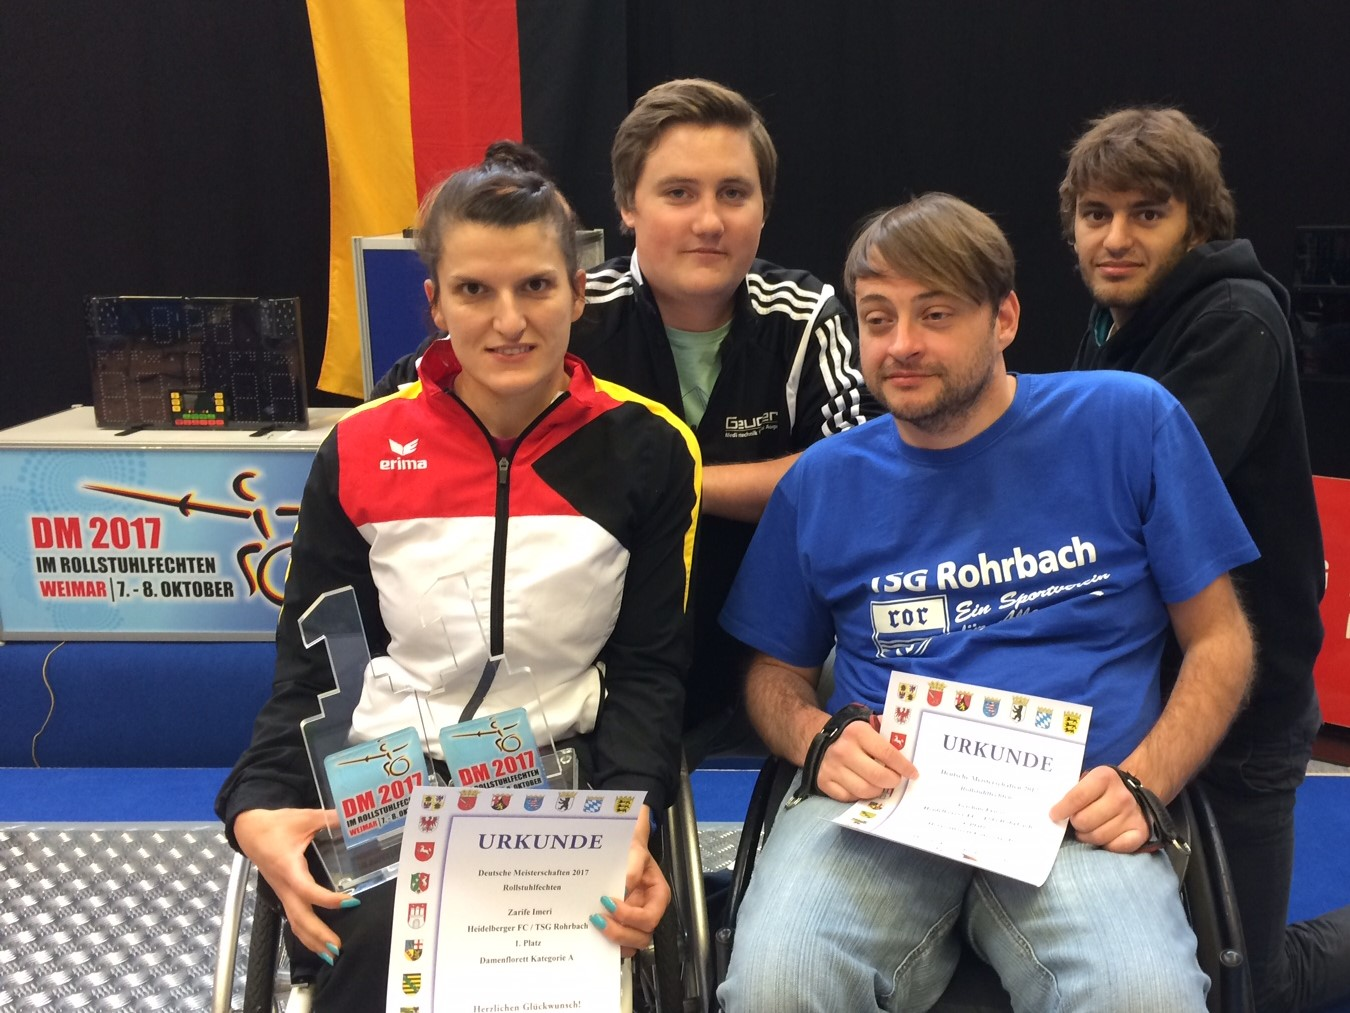 Heidelberg Fechten Zariffe Deutsche Meisterin